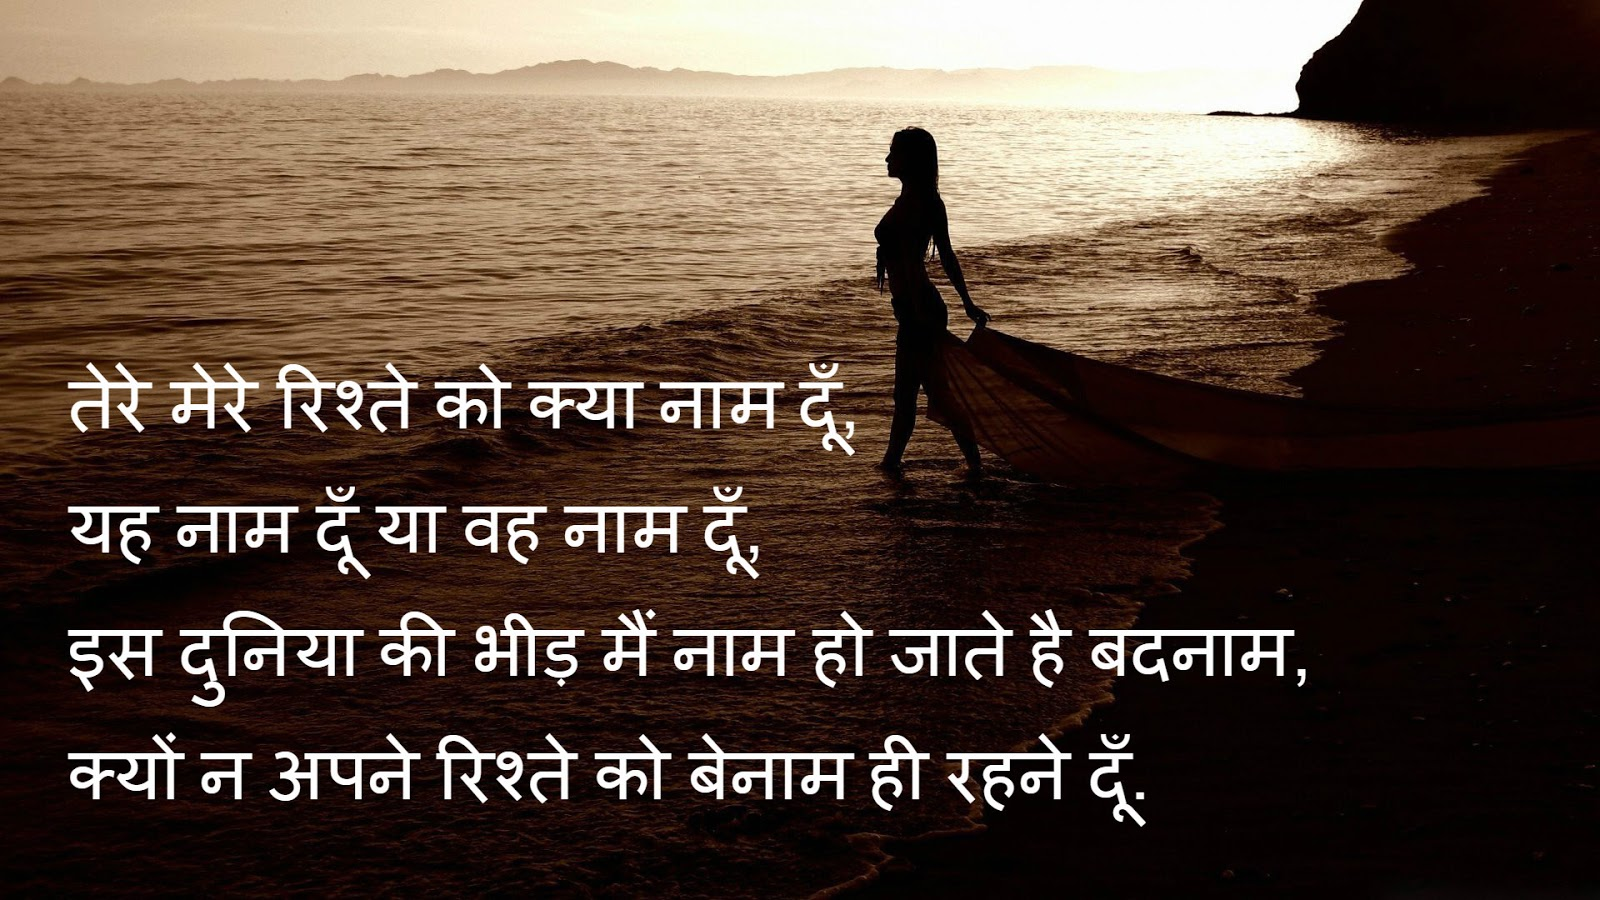 Alone sad sad hindi shayari heart broken pics, sayings